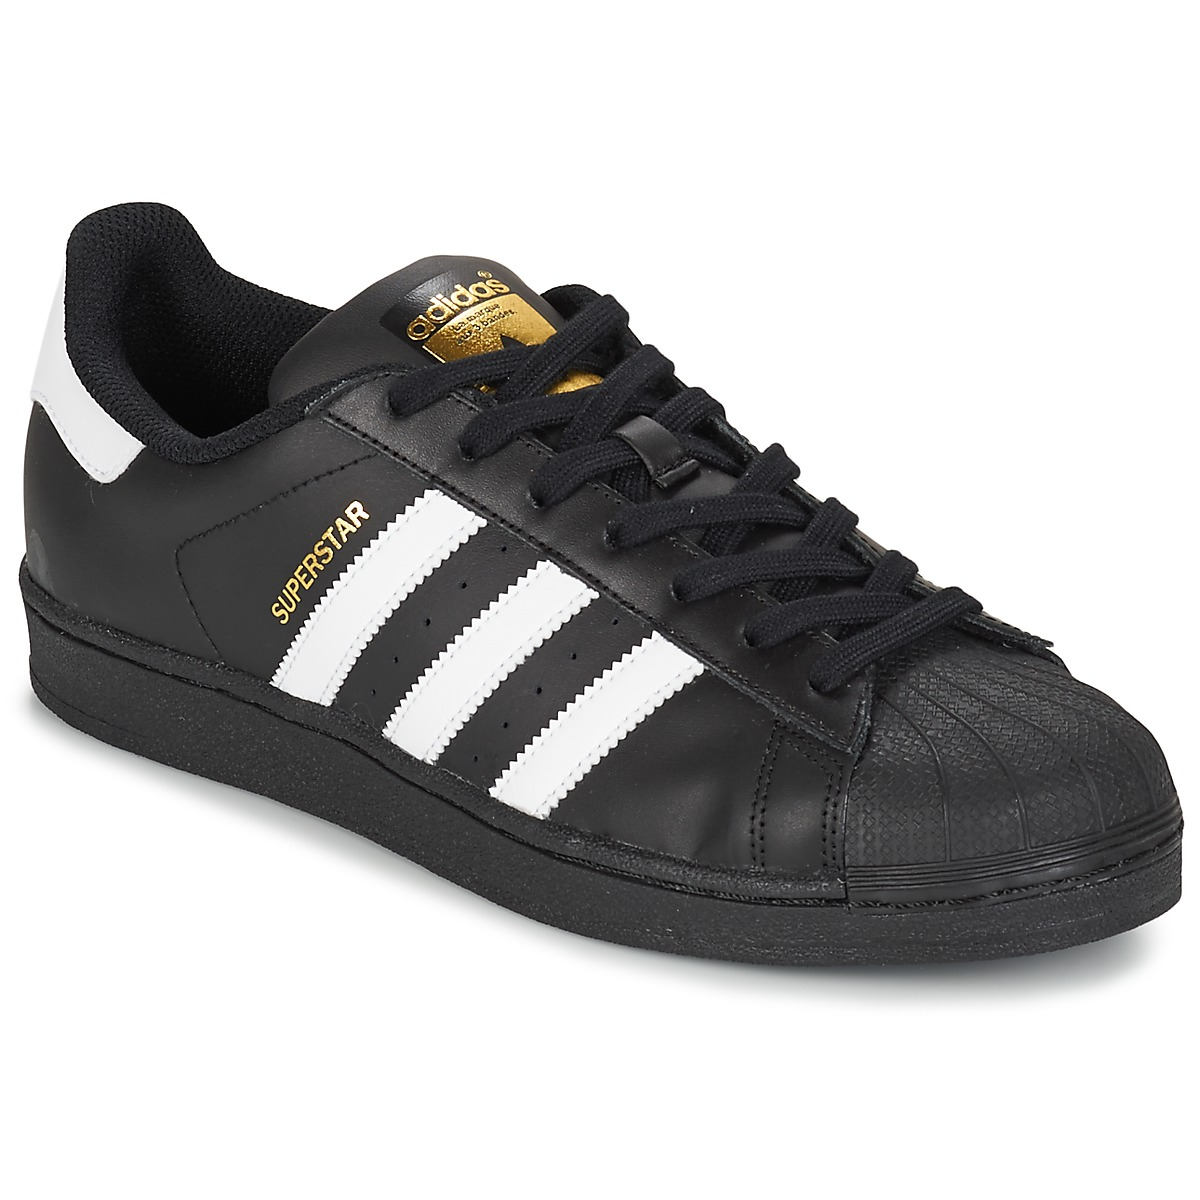 Adidas Superstar Femminili Prezzo